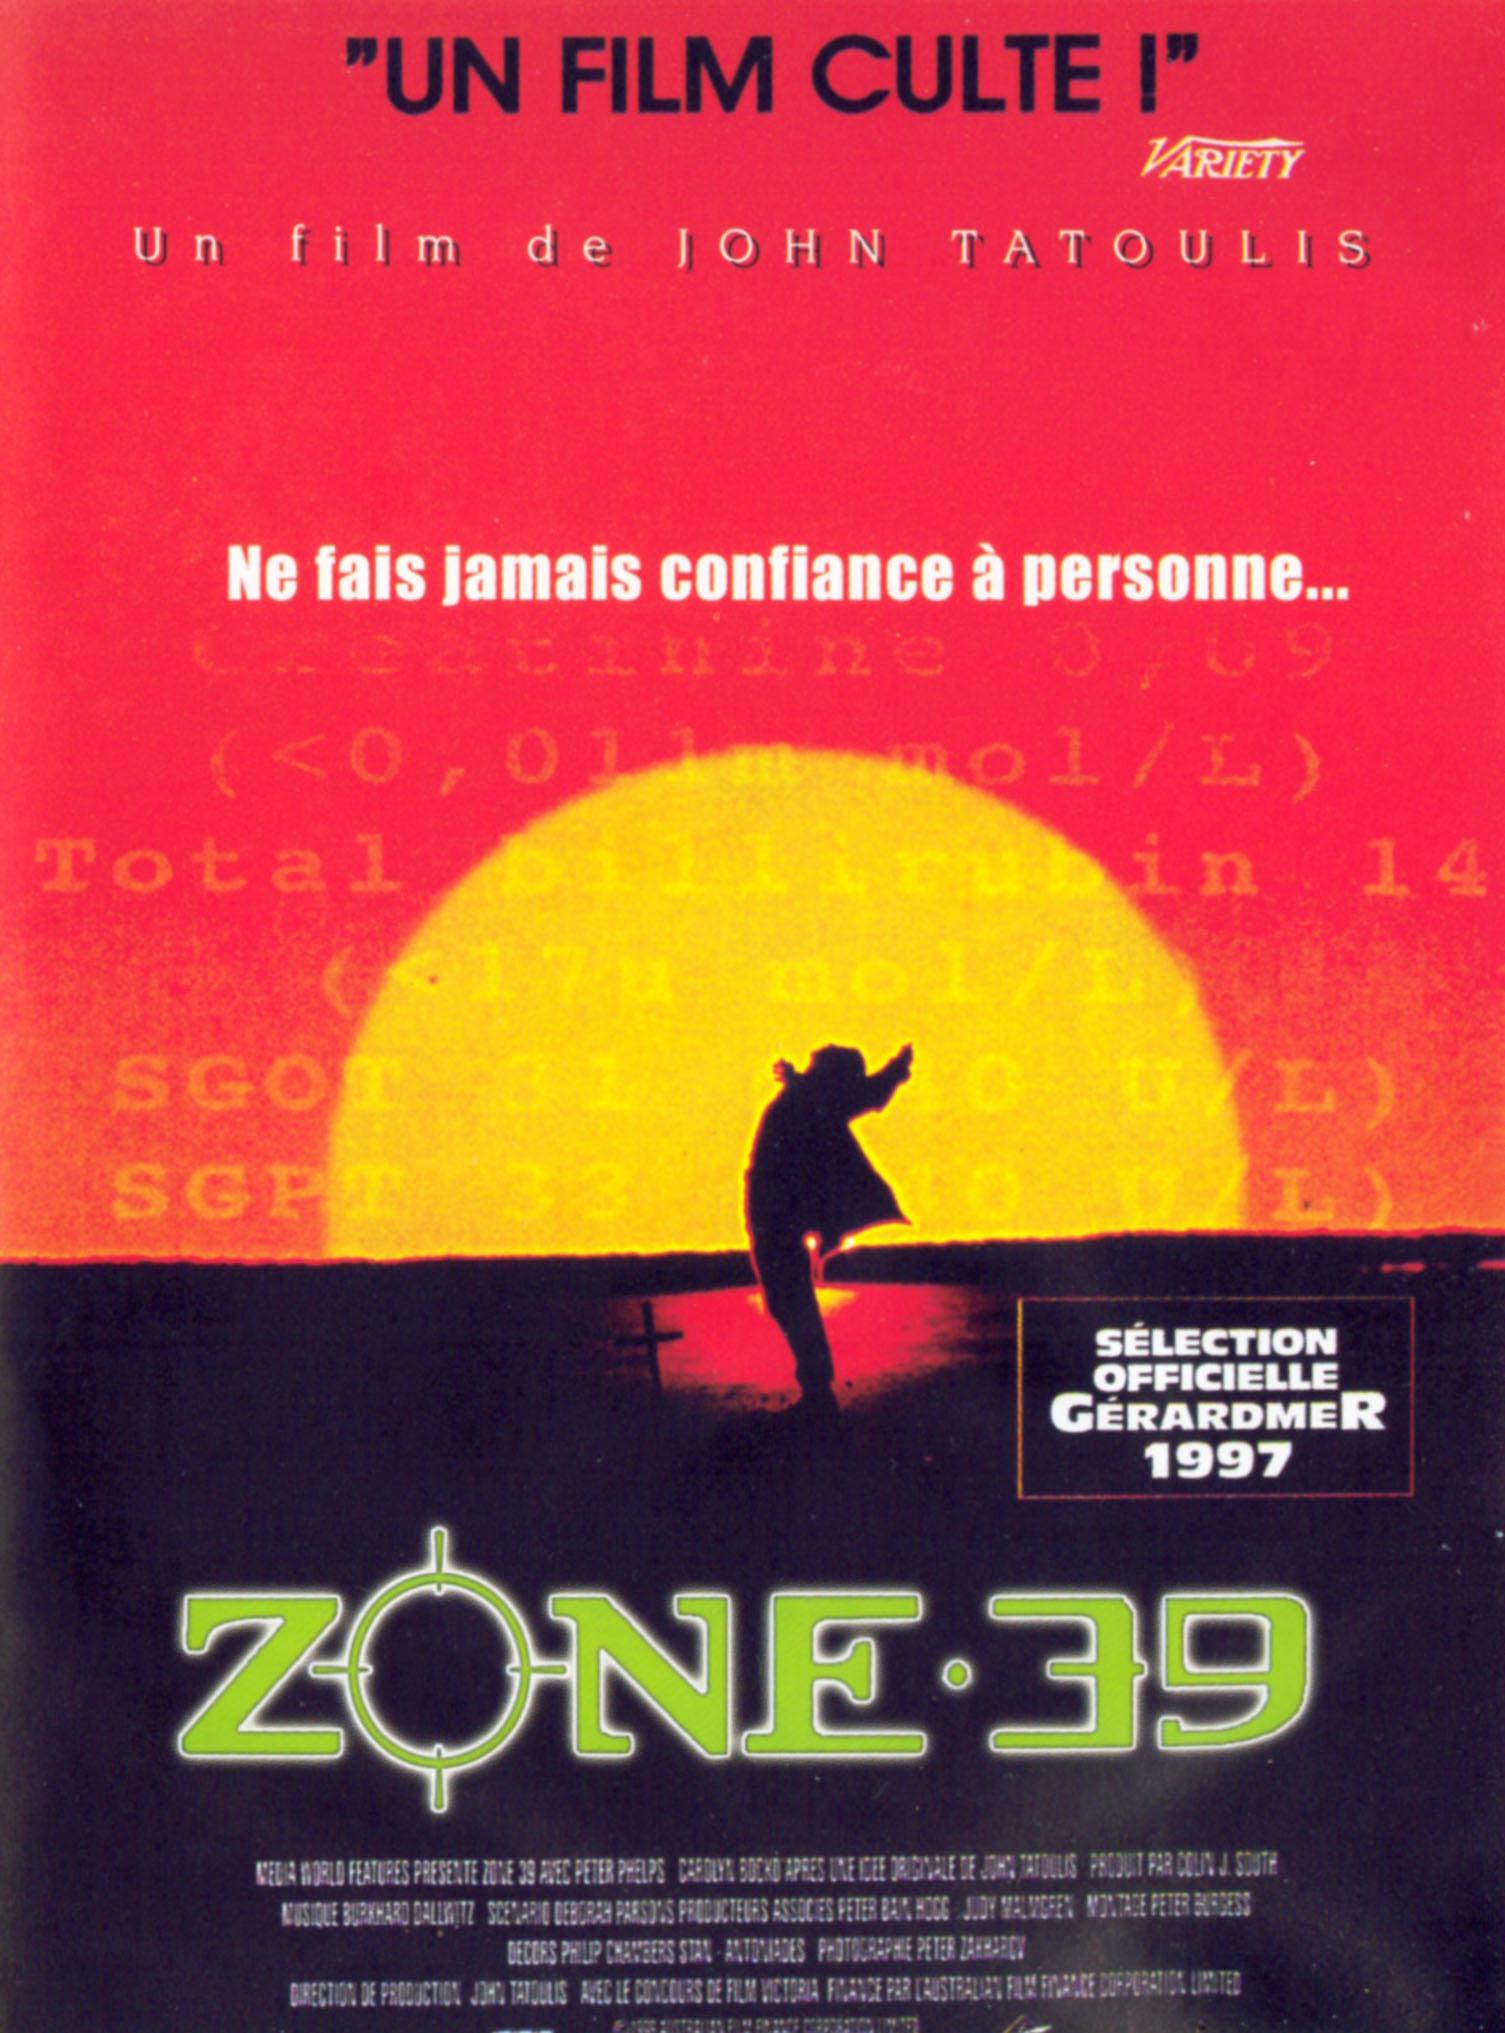 (Sci-Fi) Zone 39 [DVDrip] 1996